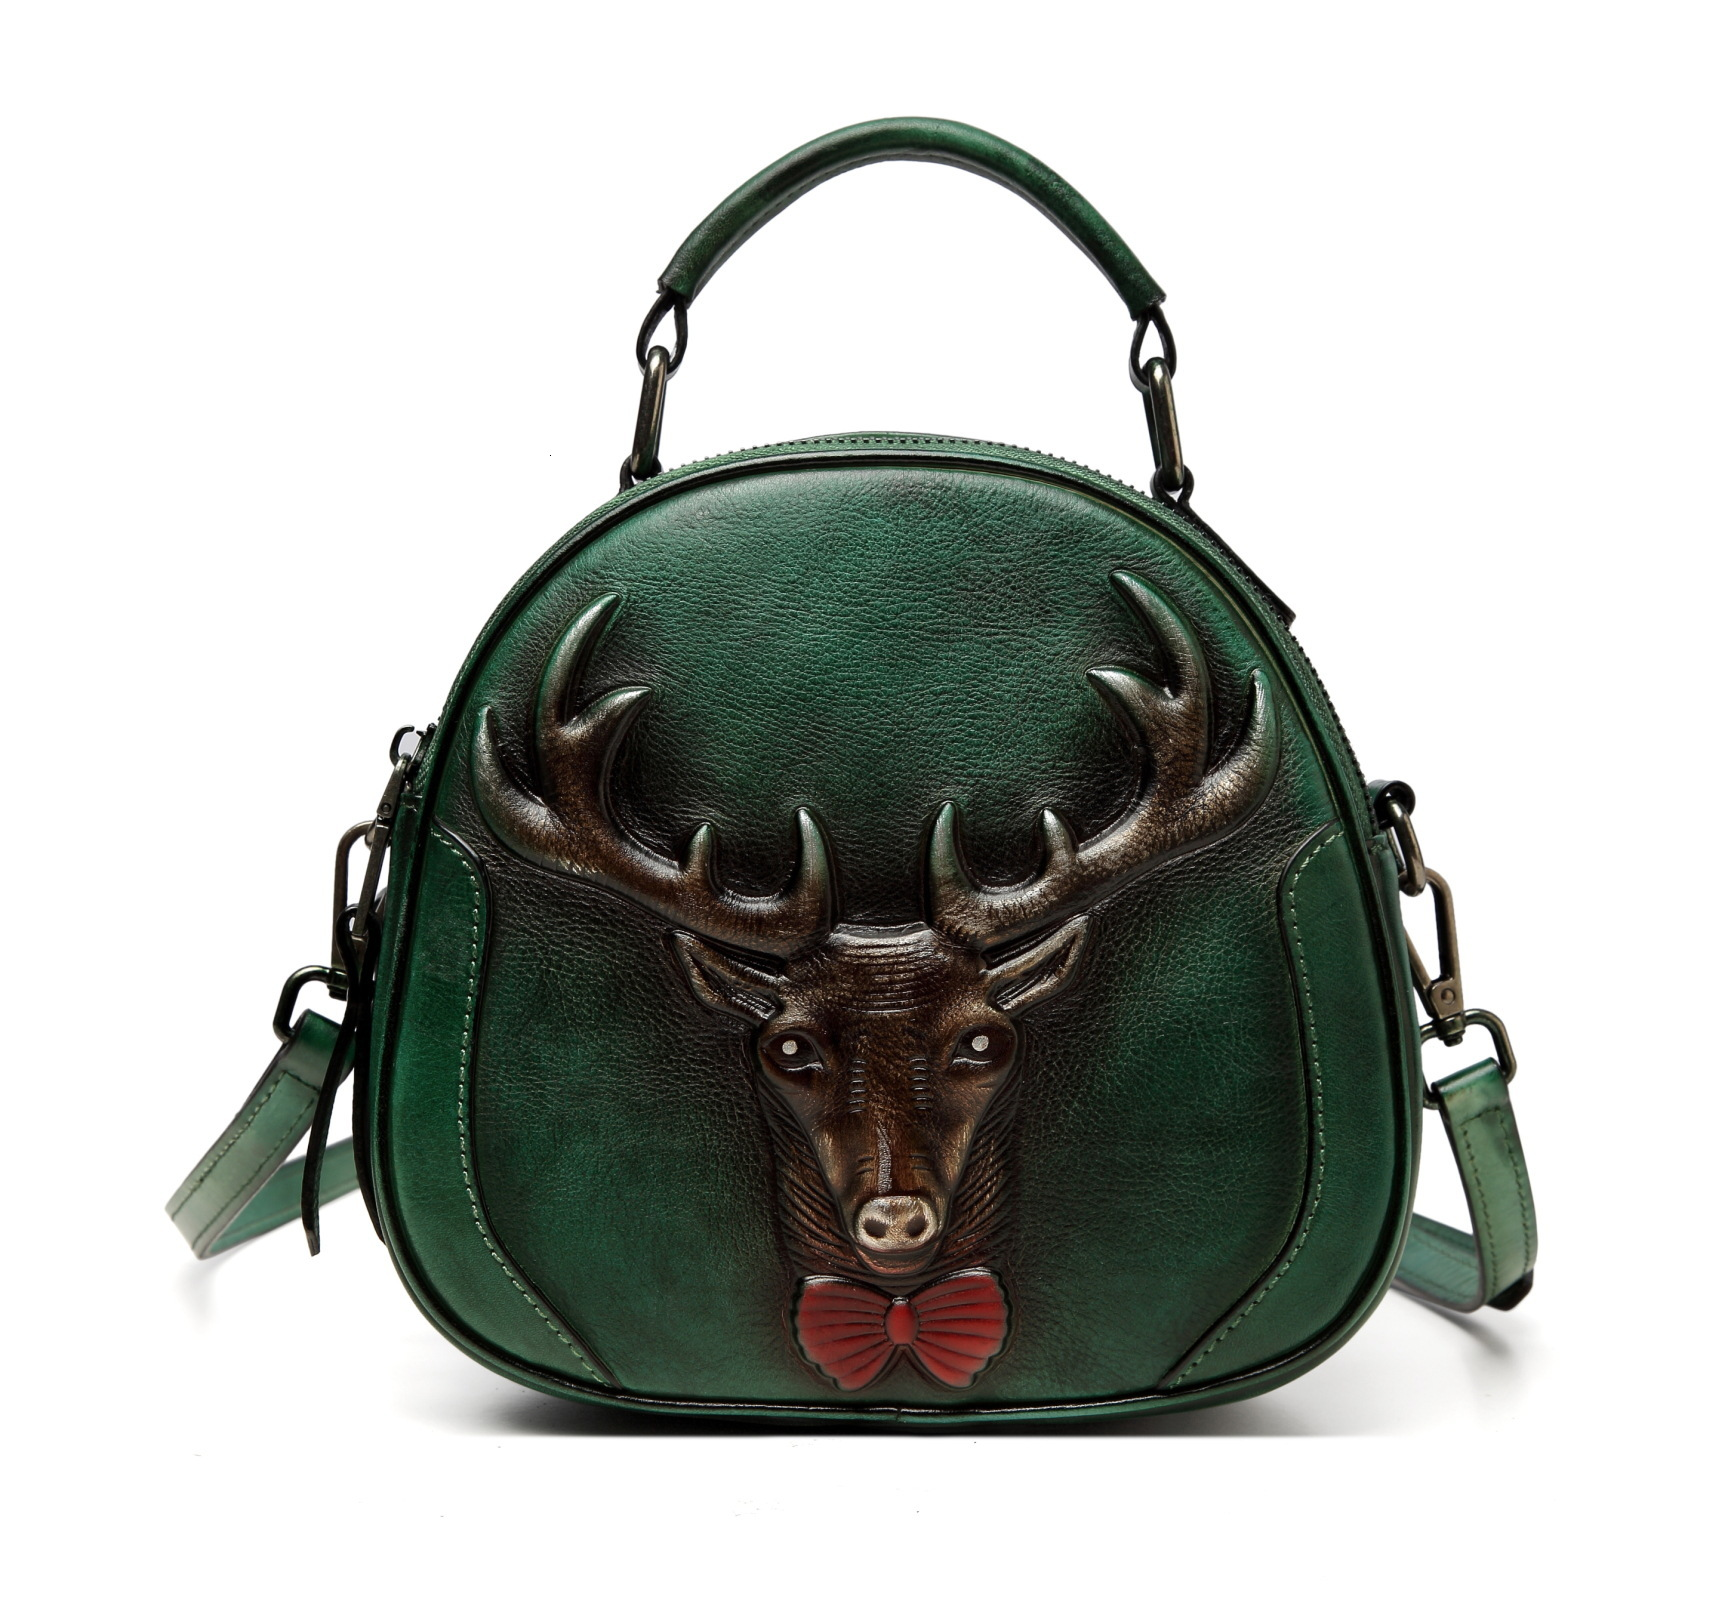 Women Embossed Top Handle Round Mini Bags Handbag Vintage Cowhide Cross Body Tote Purse Genuine Leather Messenger Shoulder Bag